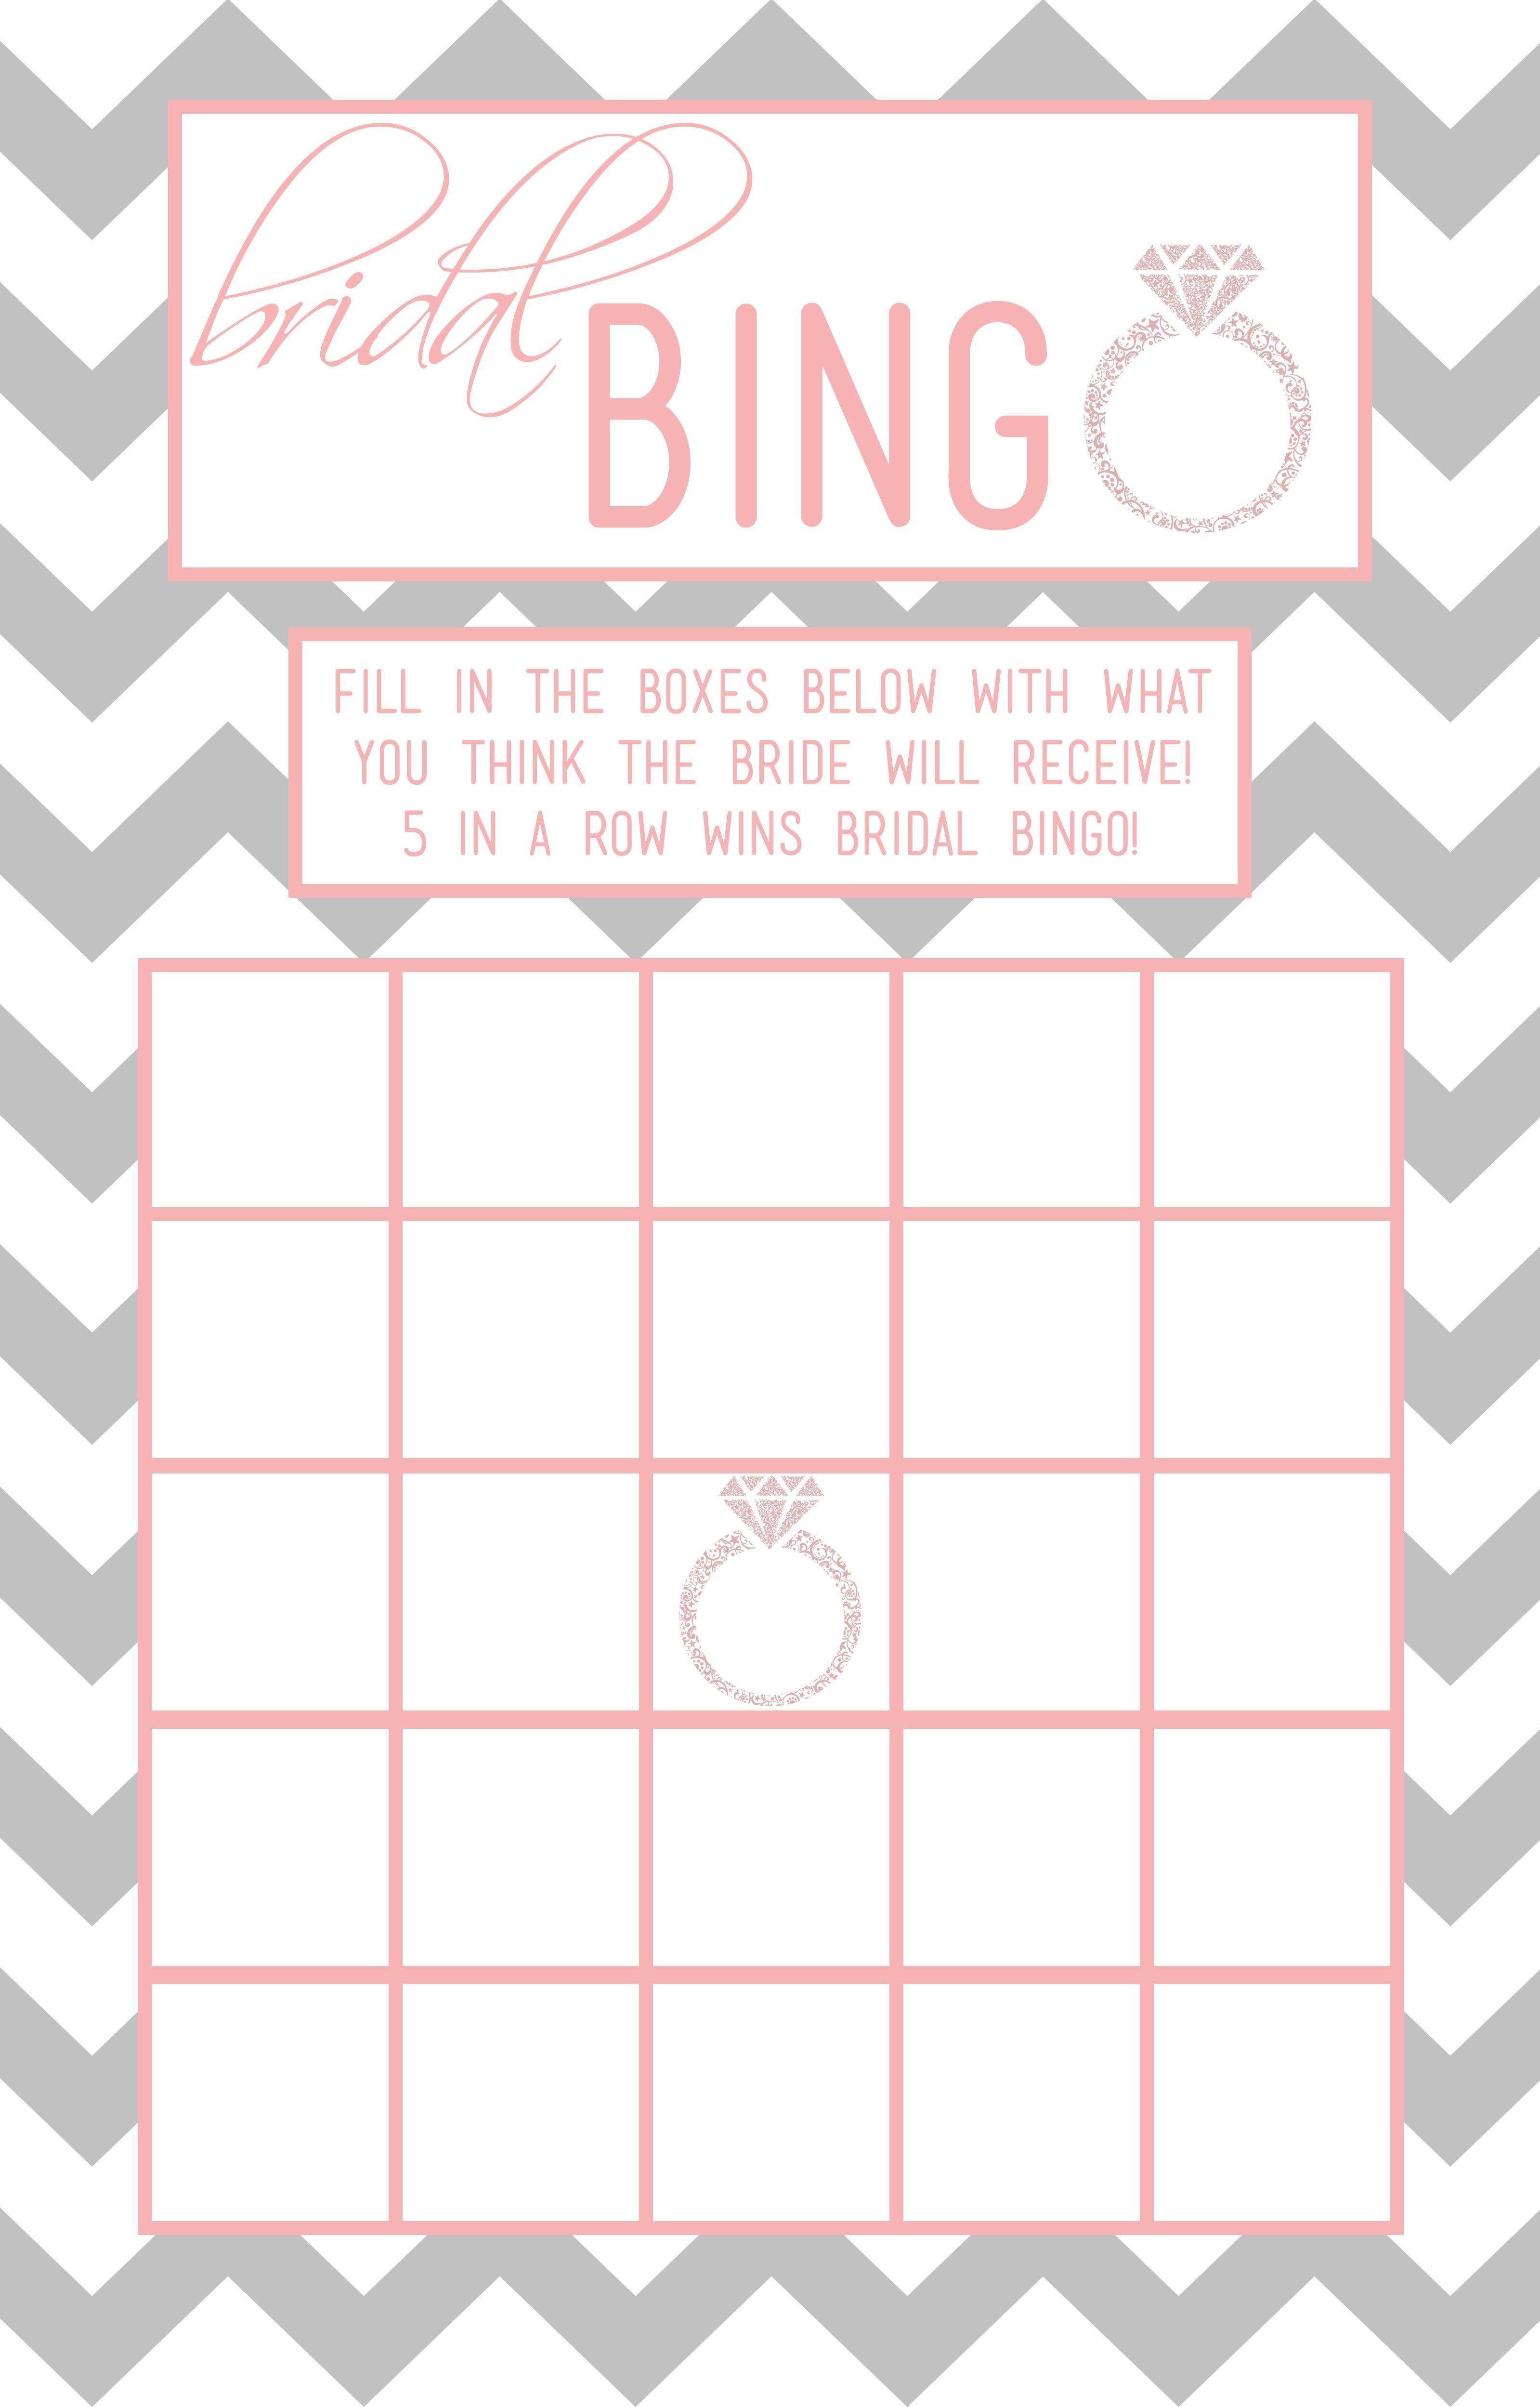 Bridal Bingo Template – 28 Images – Free Printable Bridal Shower - Free Printable Bridal Bingo Sheets